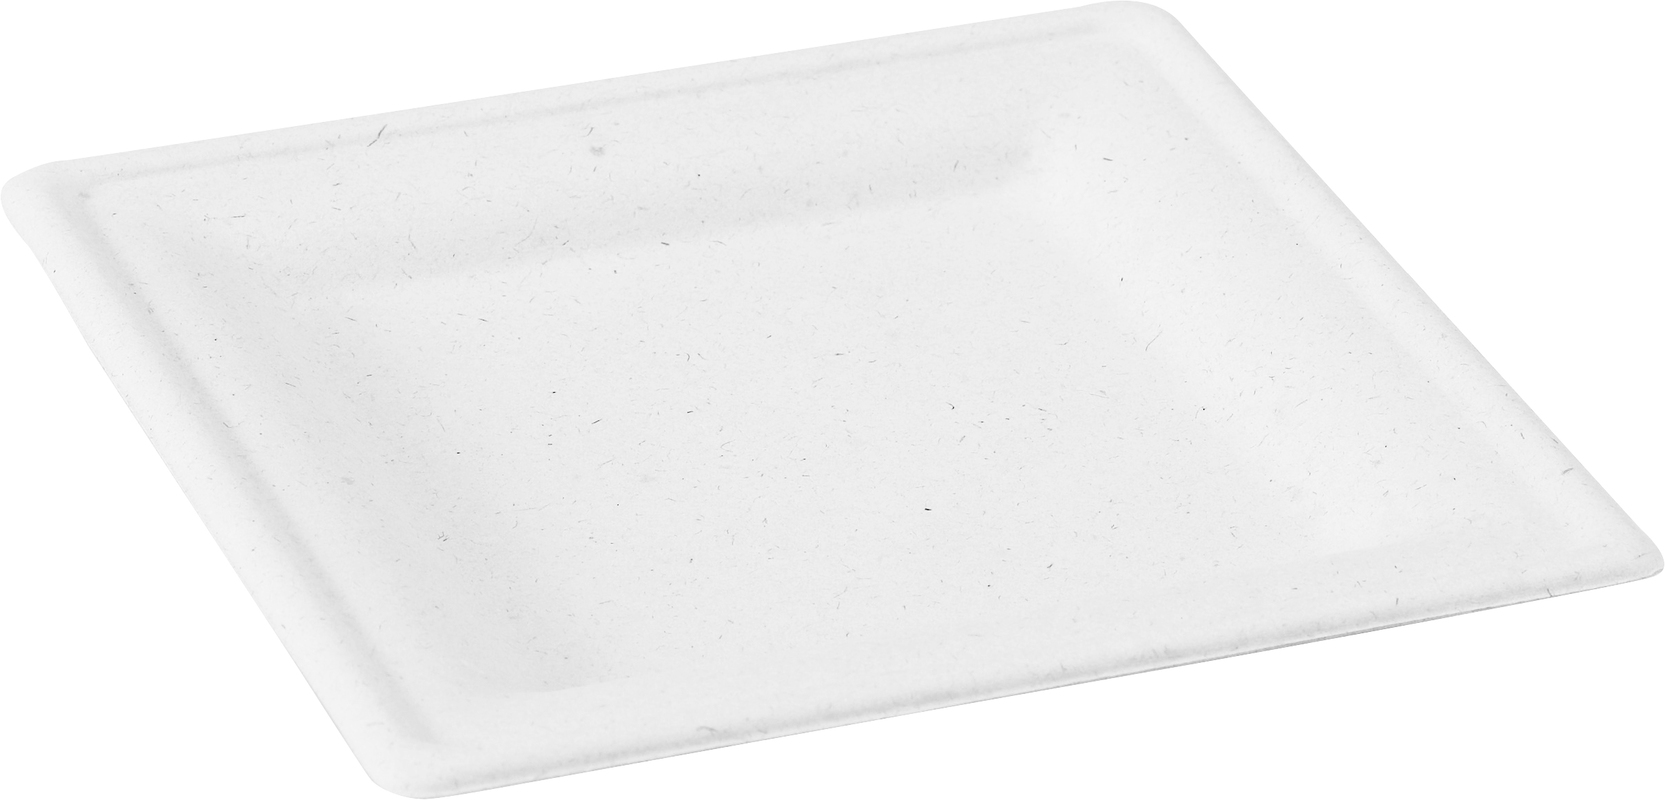 Square fiber plate 7.8 x 7.8 in